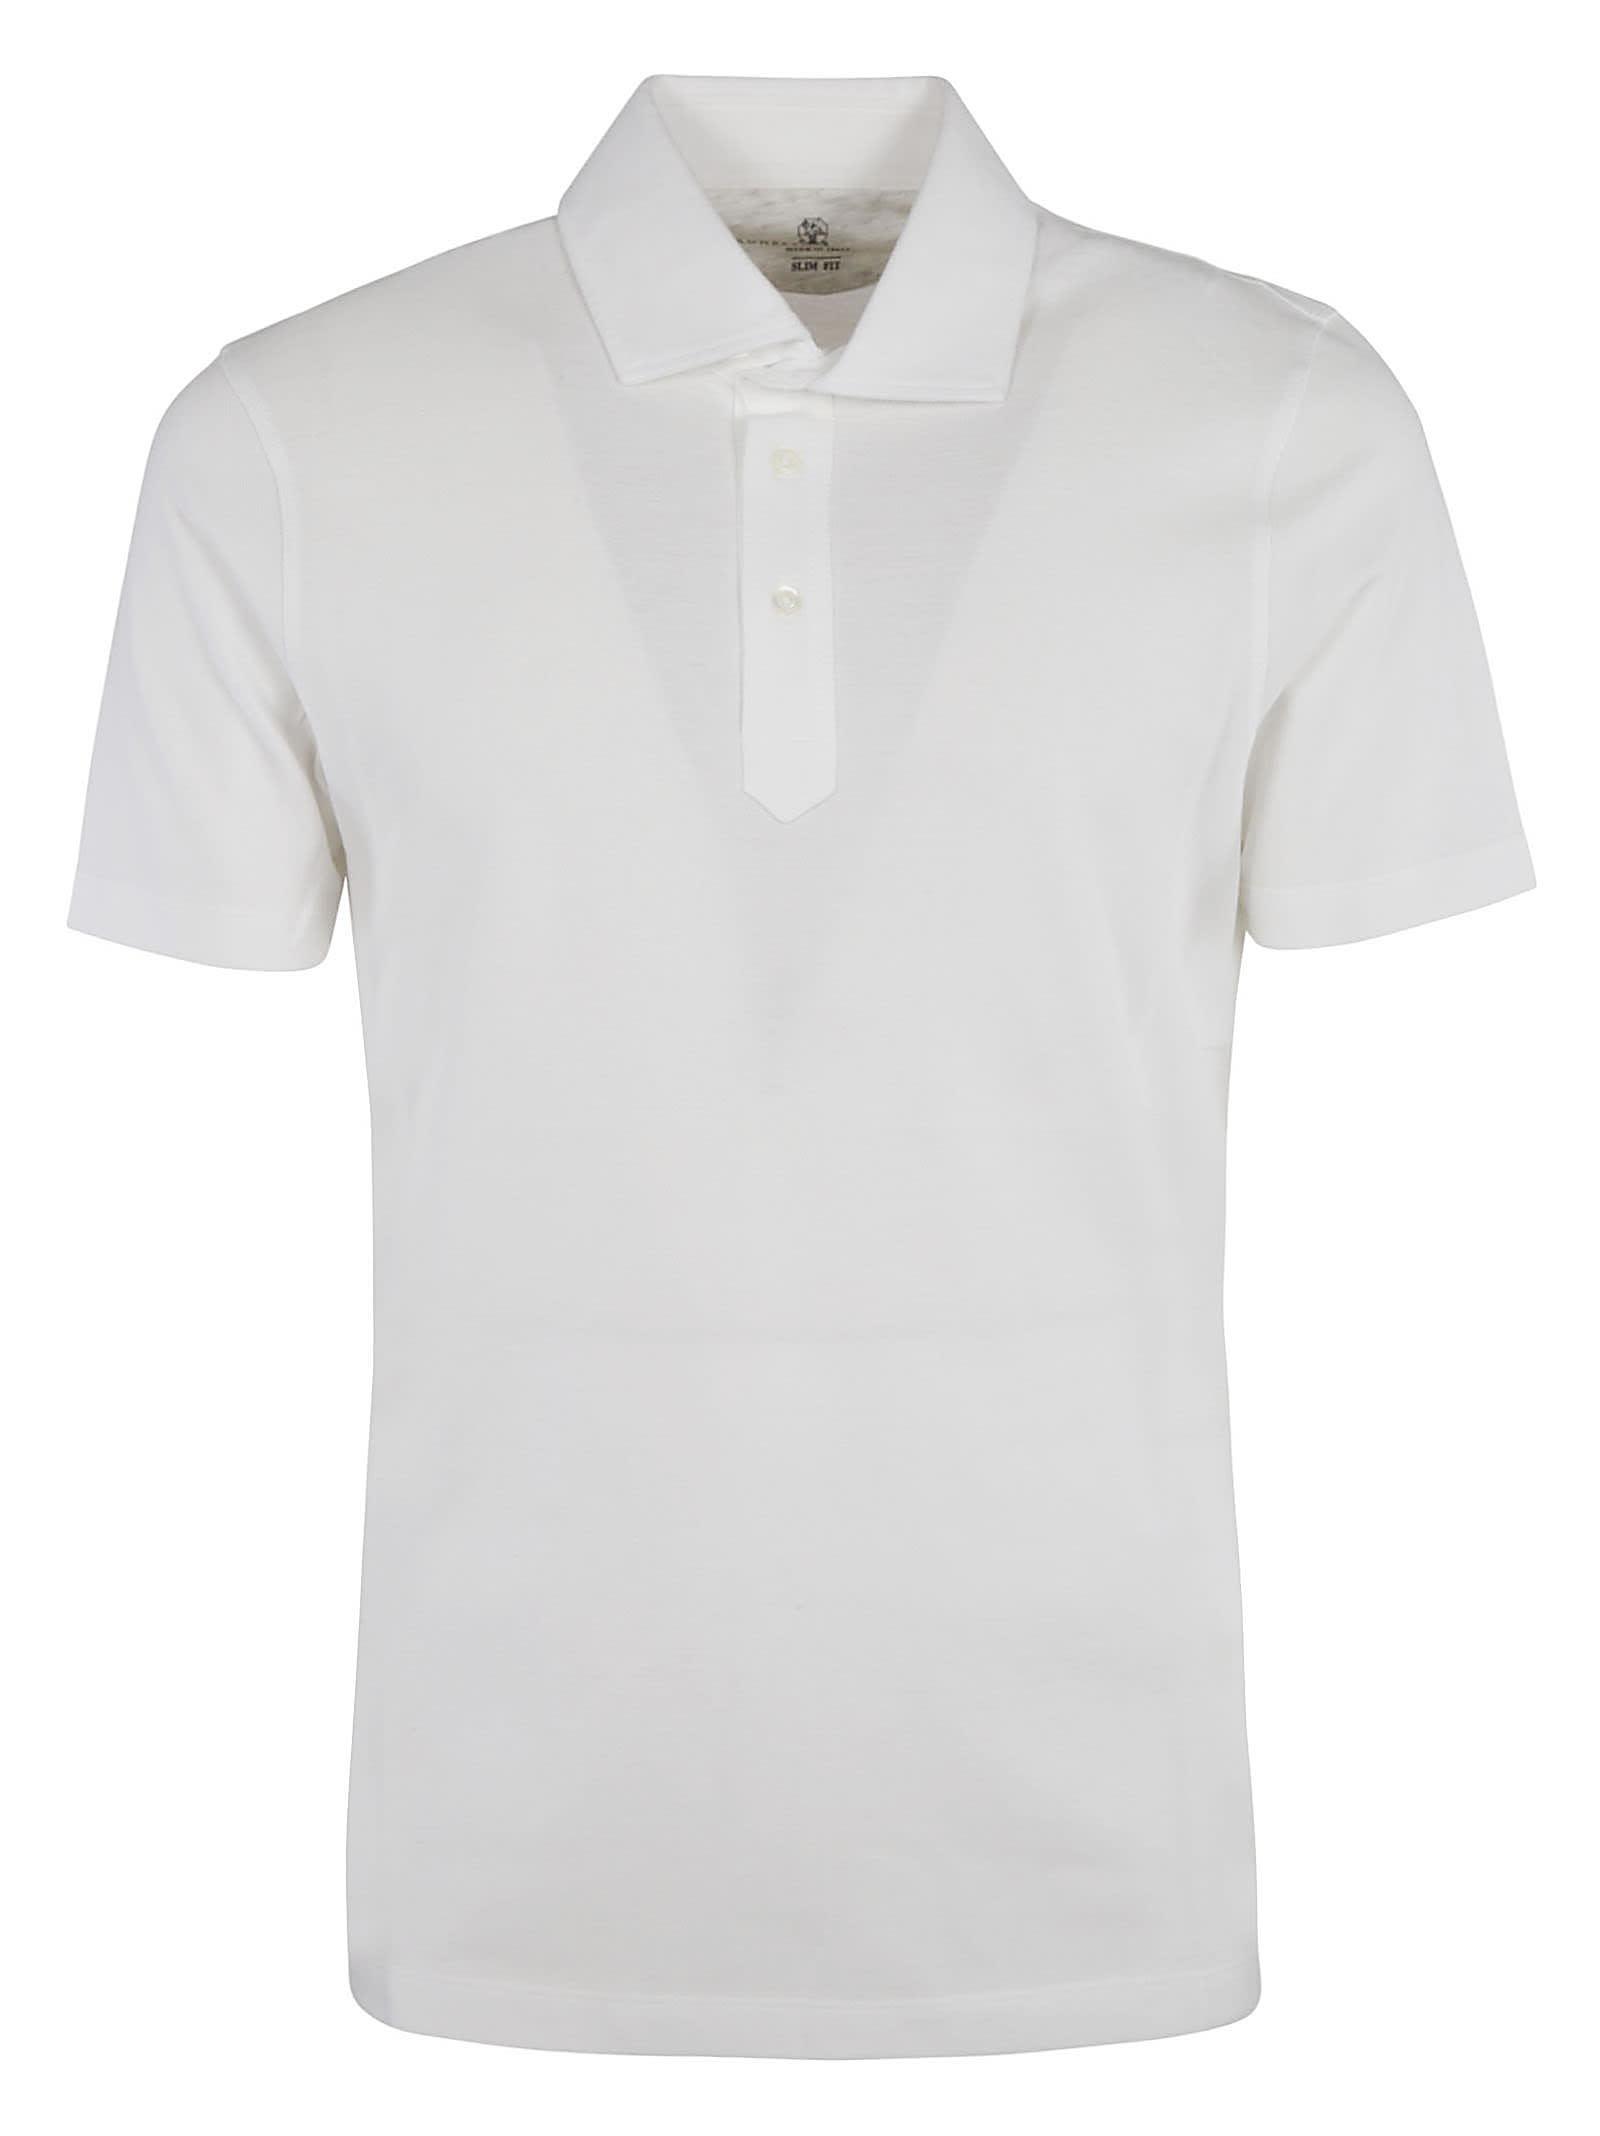 Brunello Cucinelli Classic Plain Polo Shirt